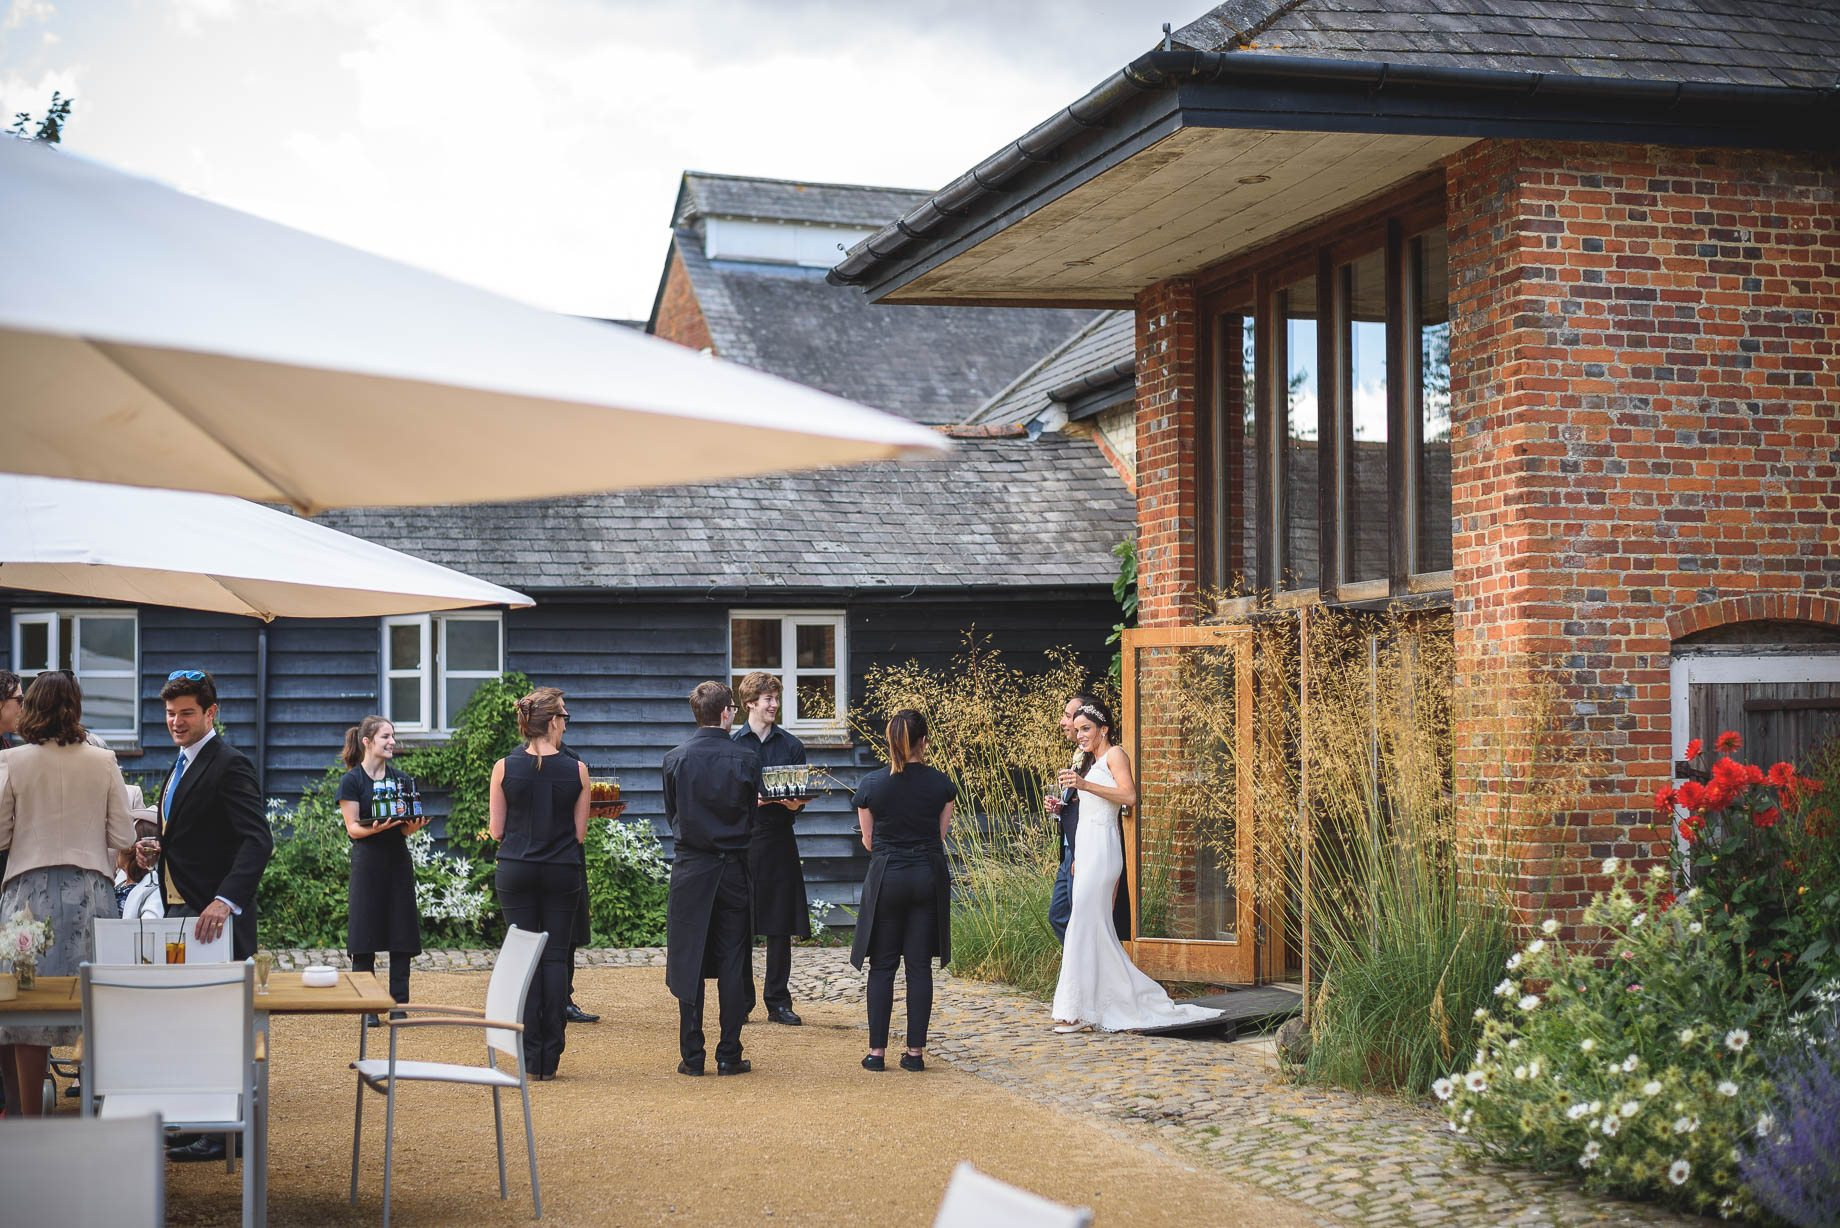 Bury Court Barn Wedding Photography - Caroline and Rob (92 of 219)